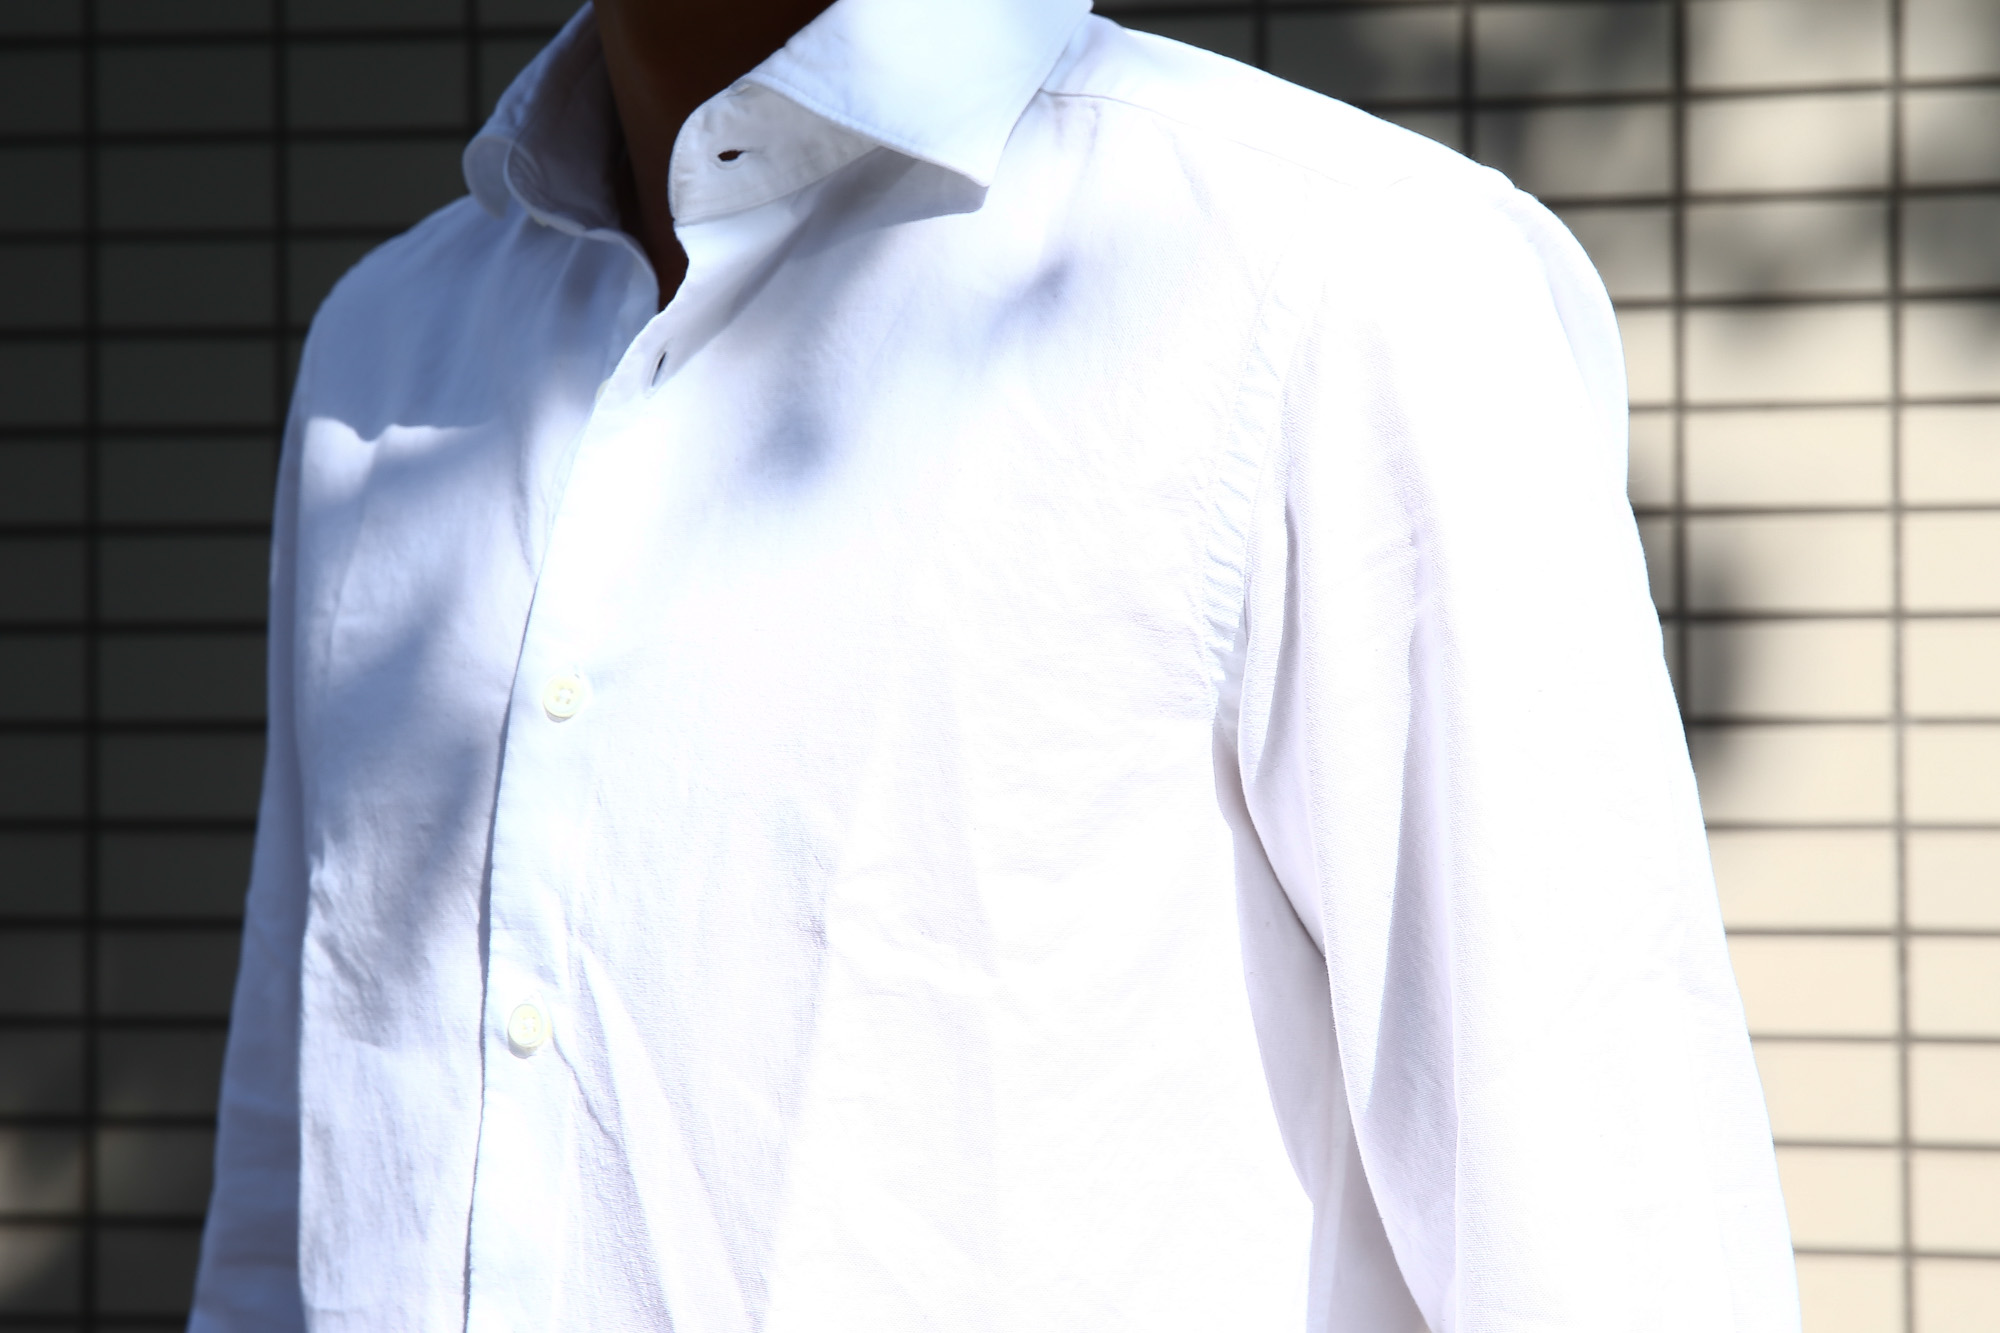 Glanshirt (グランシャツ) JWEEN G6971 OXFORD COTTON 100% オックスフォードシャツ WHITE (ホワイト・001) MADE IN ITALY(イタリア製) 2016 秋冬新作 のコーディネート画像。 愛知 名古屋Alto e Diritto アルト エ デリット シャツ 白シャツ 36,37,38,39,40,41